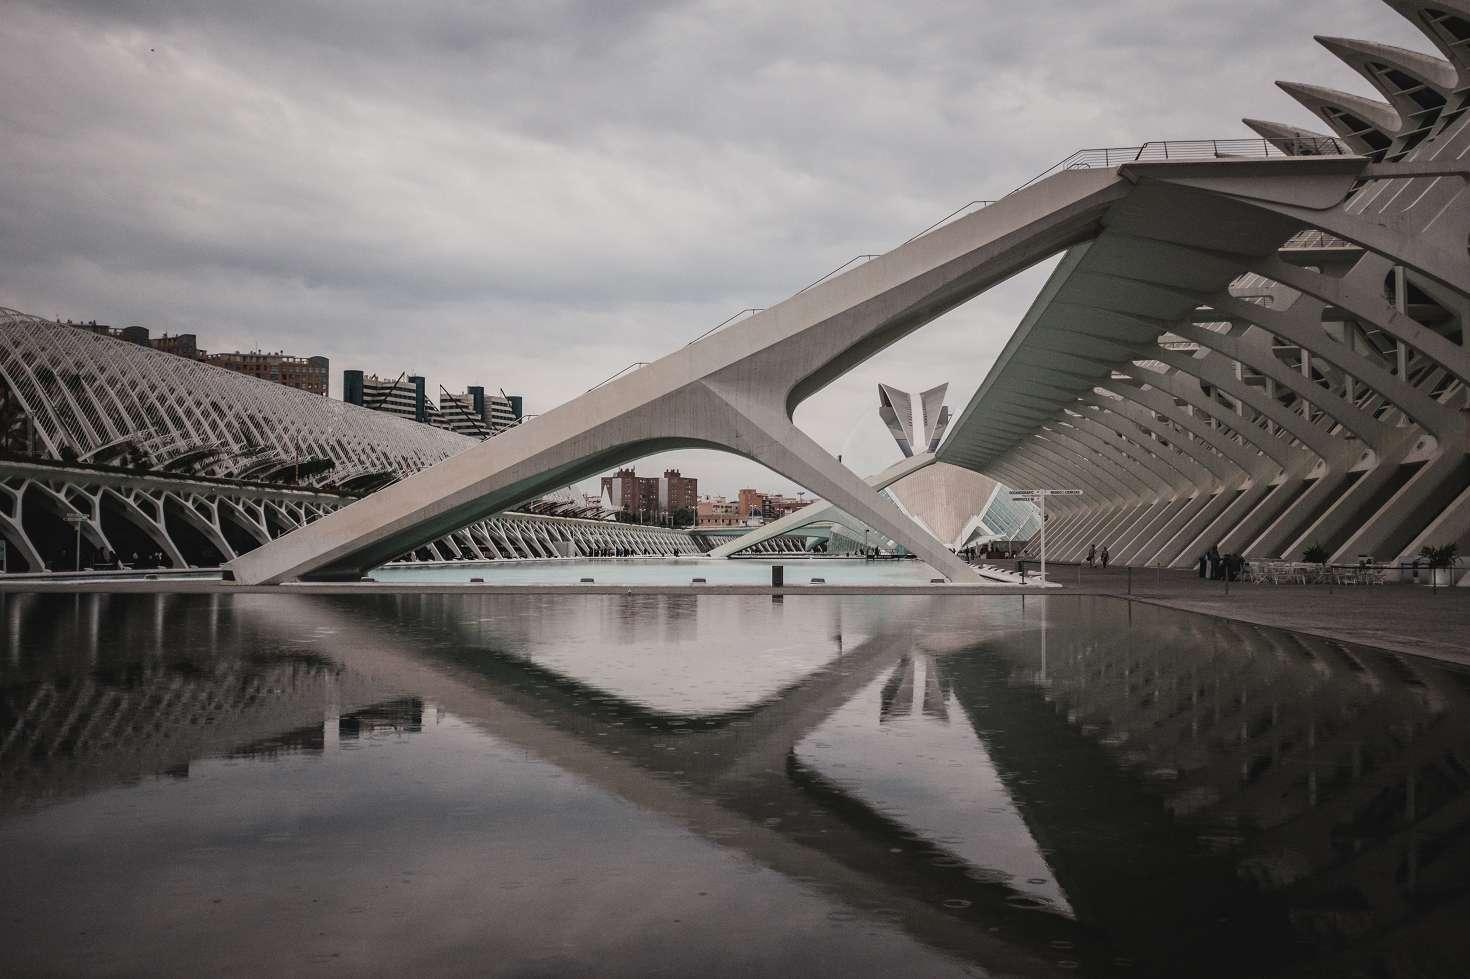 Valencia-Lissabon-Vigo-Stonehenge (1)